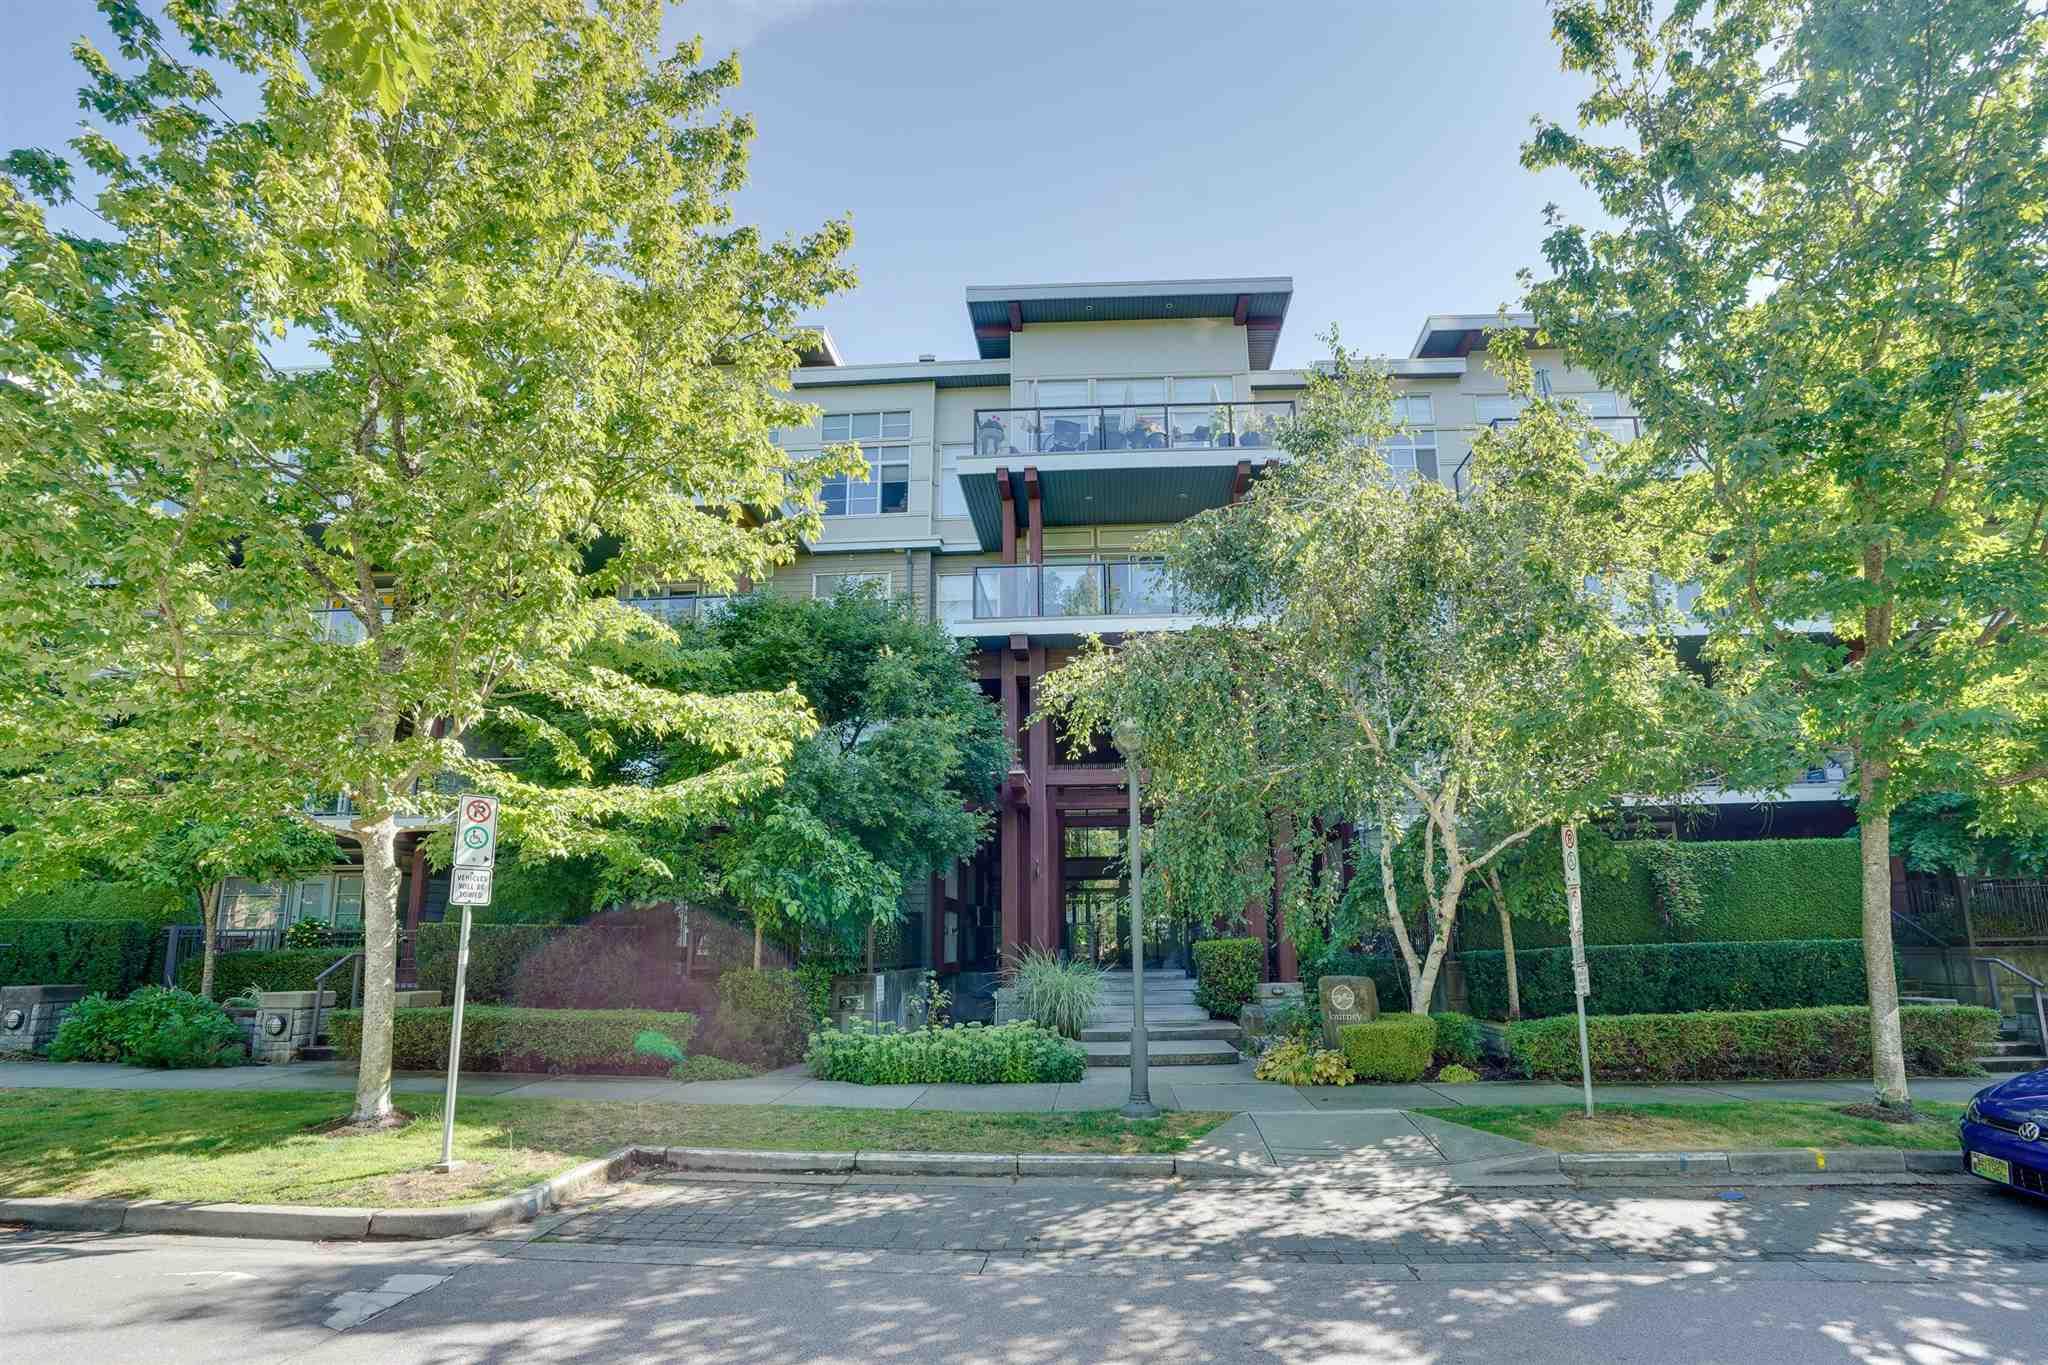 305 6328 LARKIN DRIVE - University VW Apartment/Condo for sale, 2 Bedrooms (R2605974) - #1